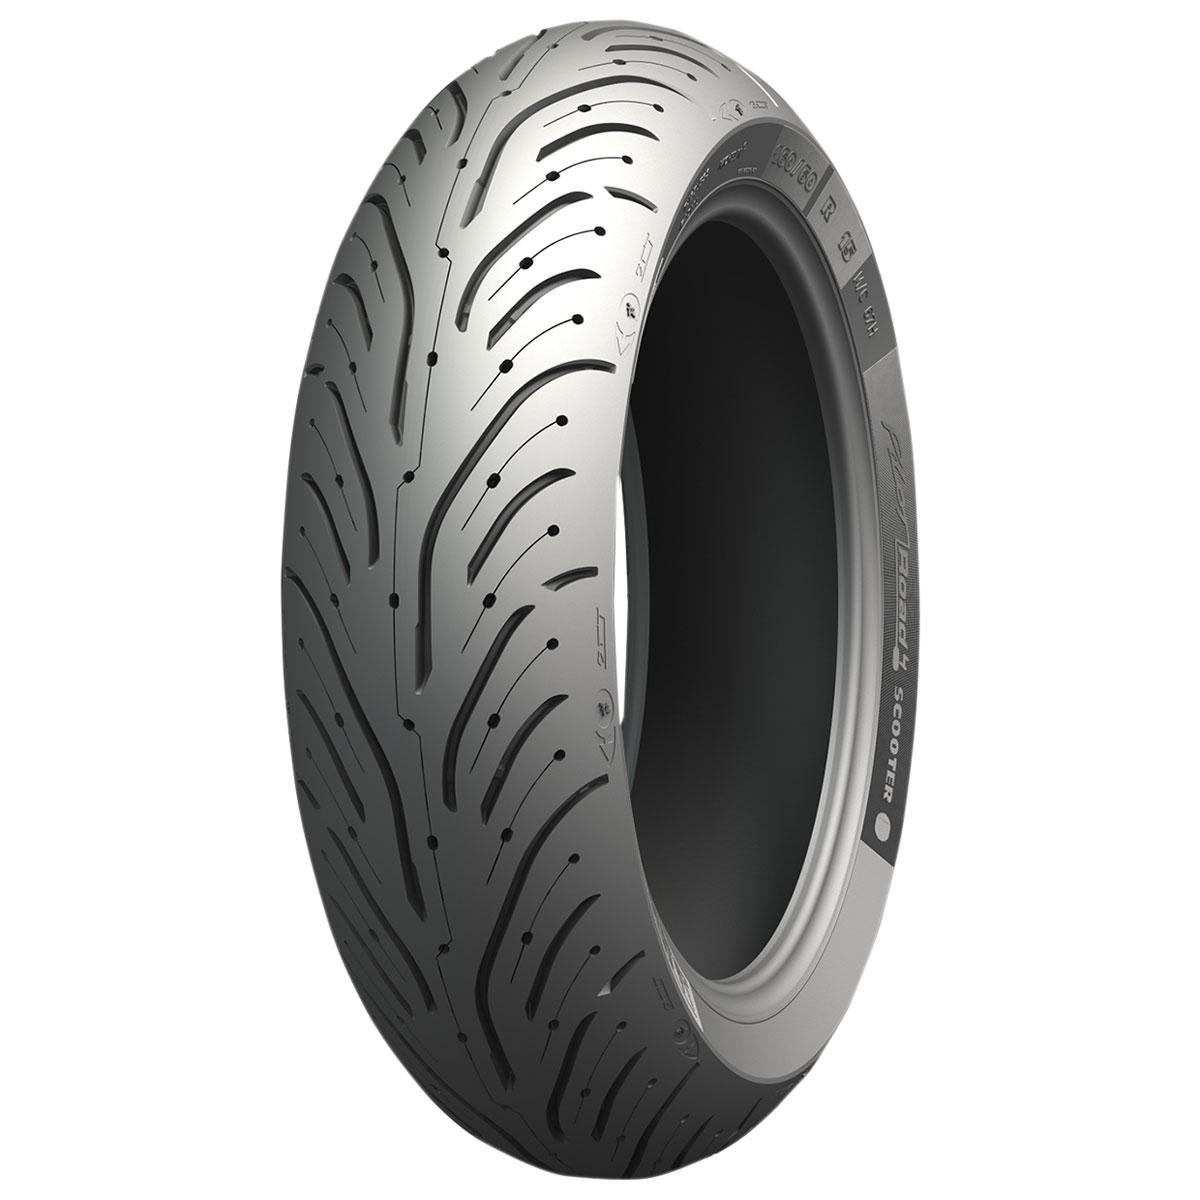 Michelin Pilot Road 4 160/60R15 Rear Tire